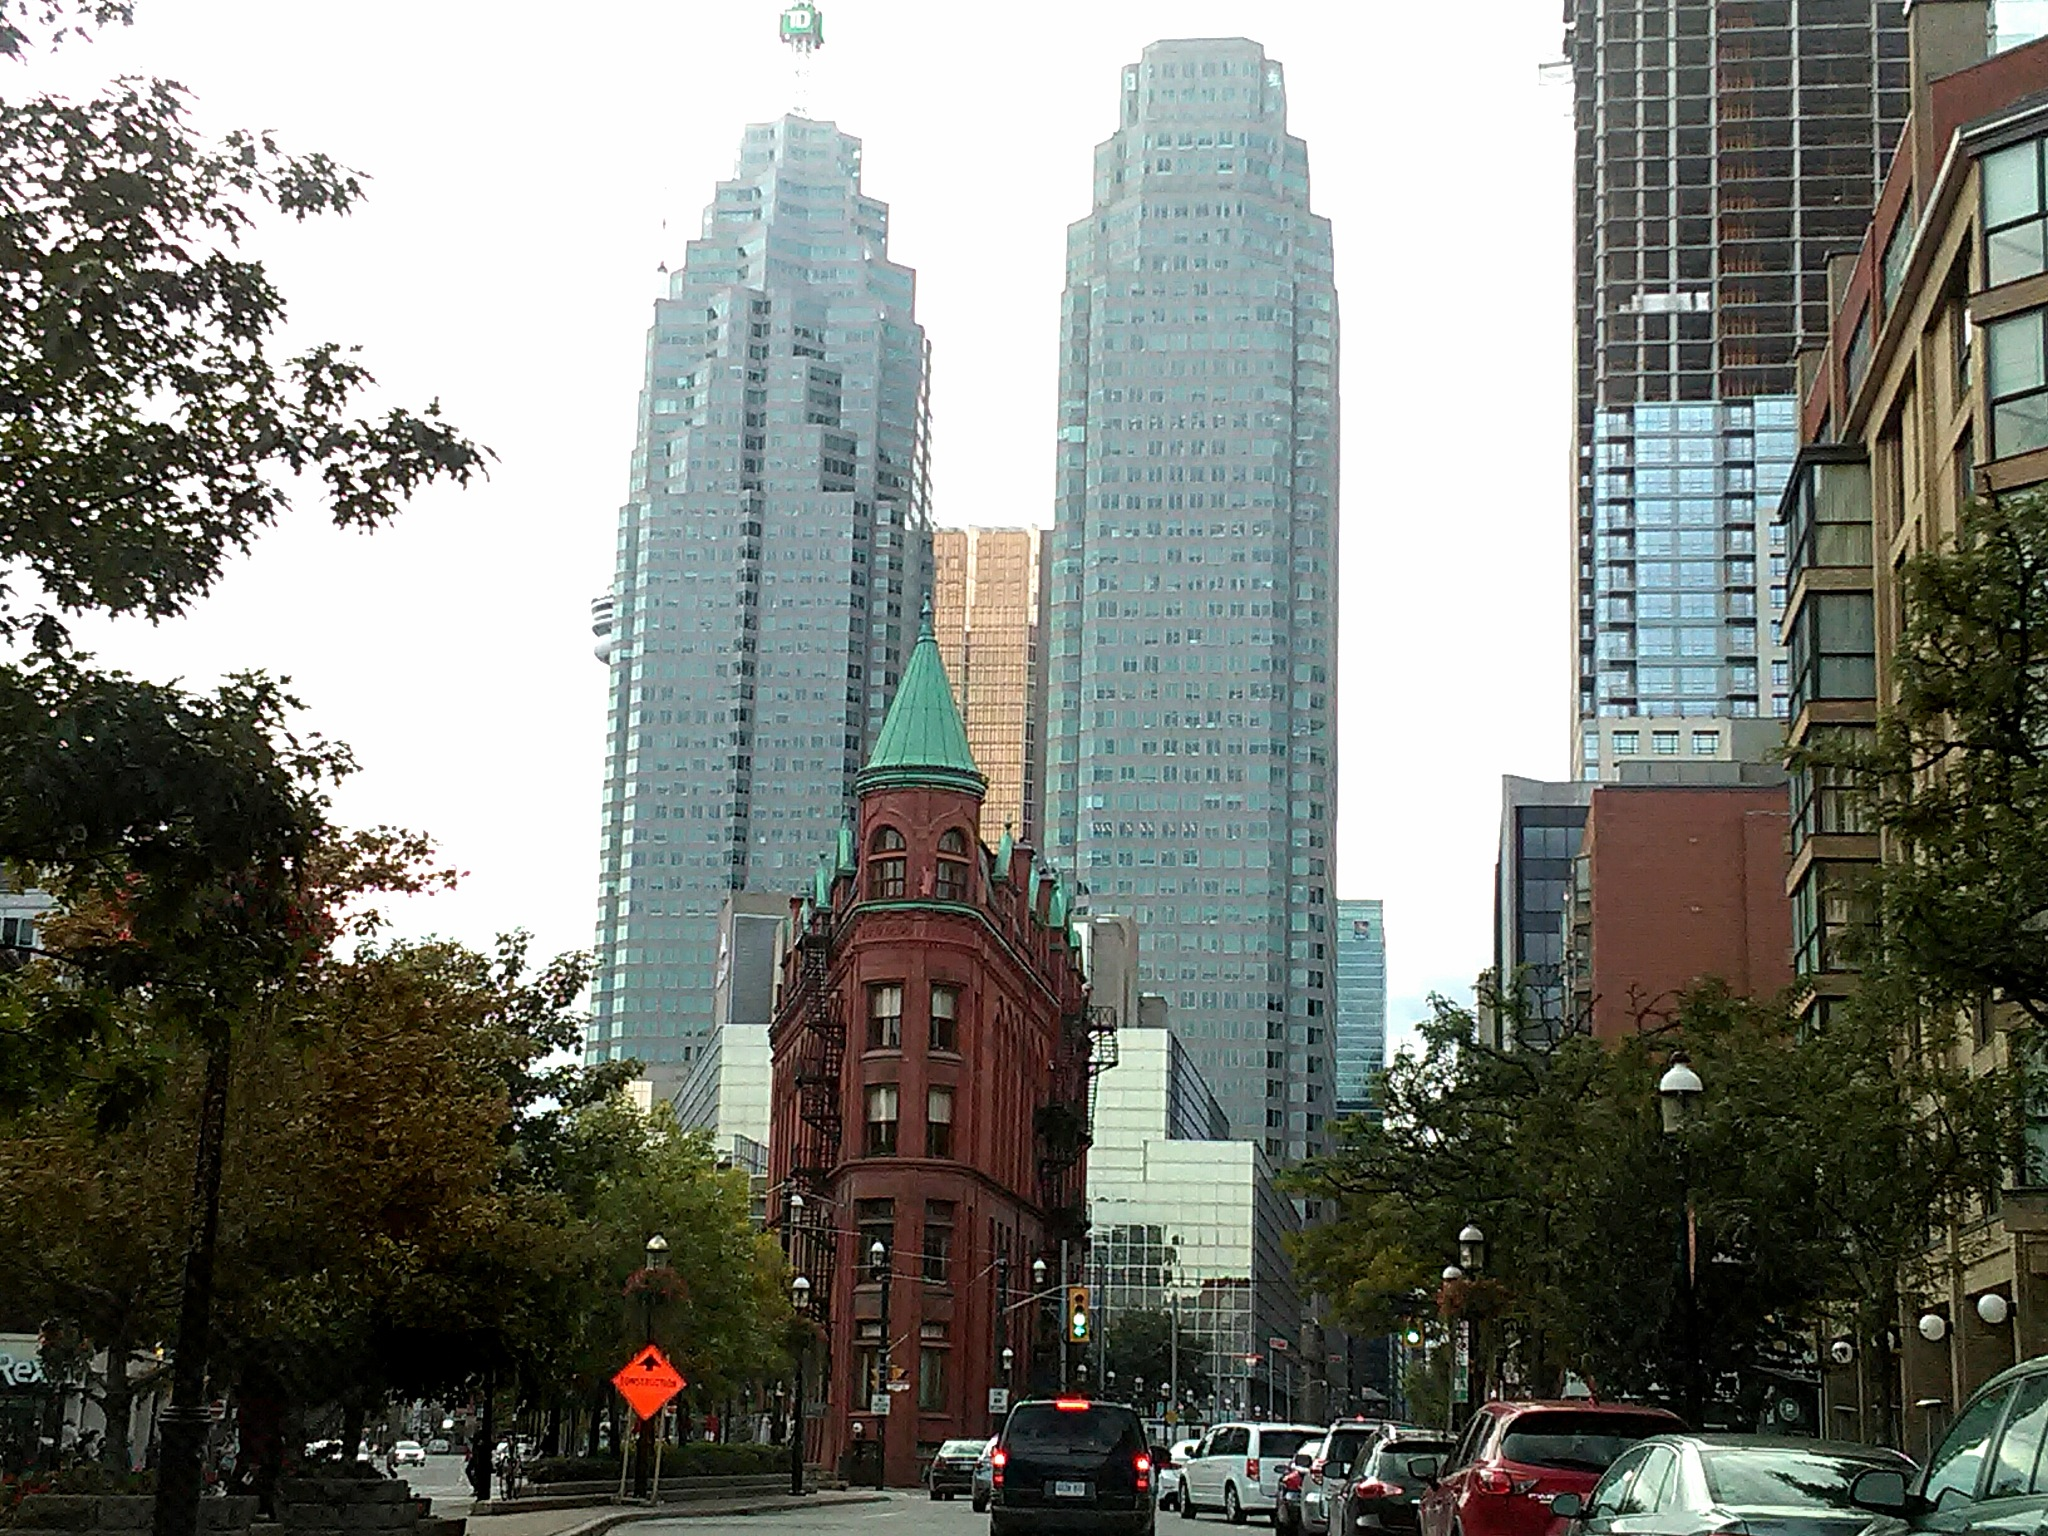 Downtown Toronto Ontario Canada by smartin3380